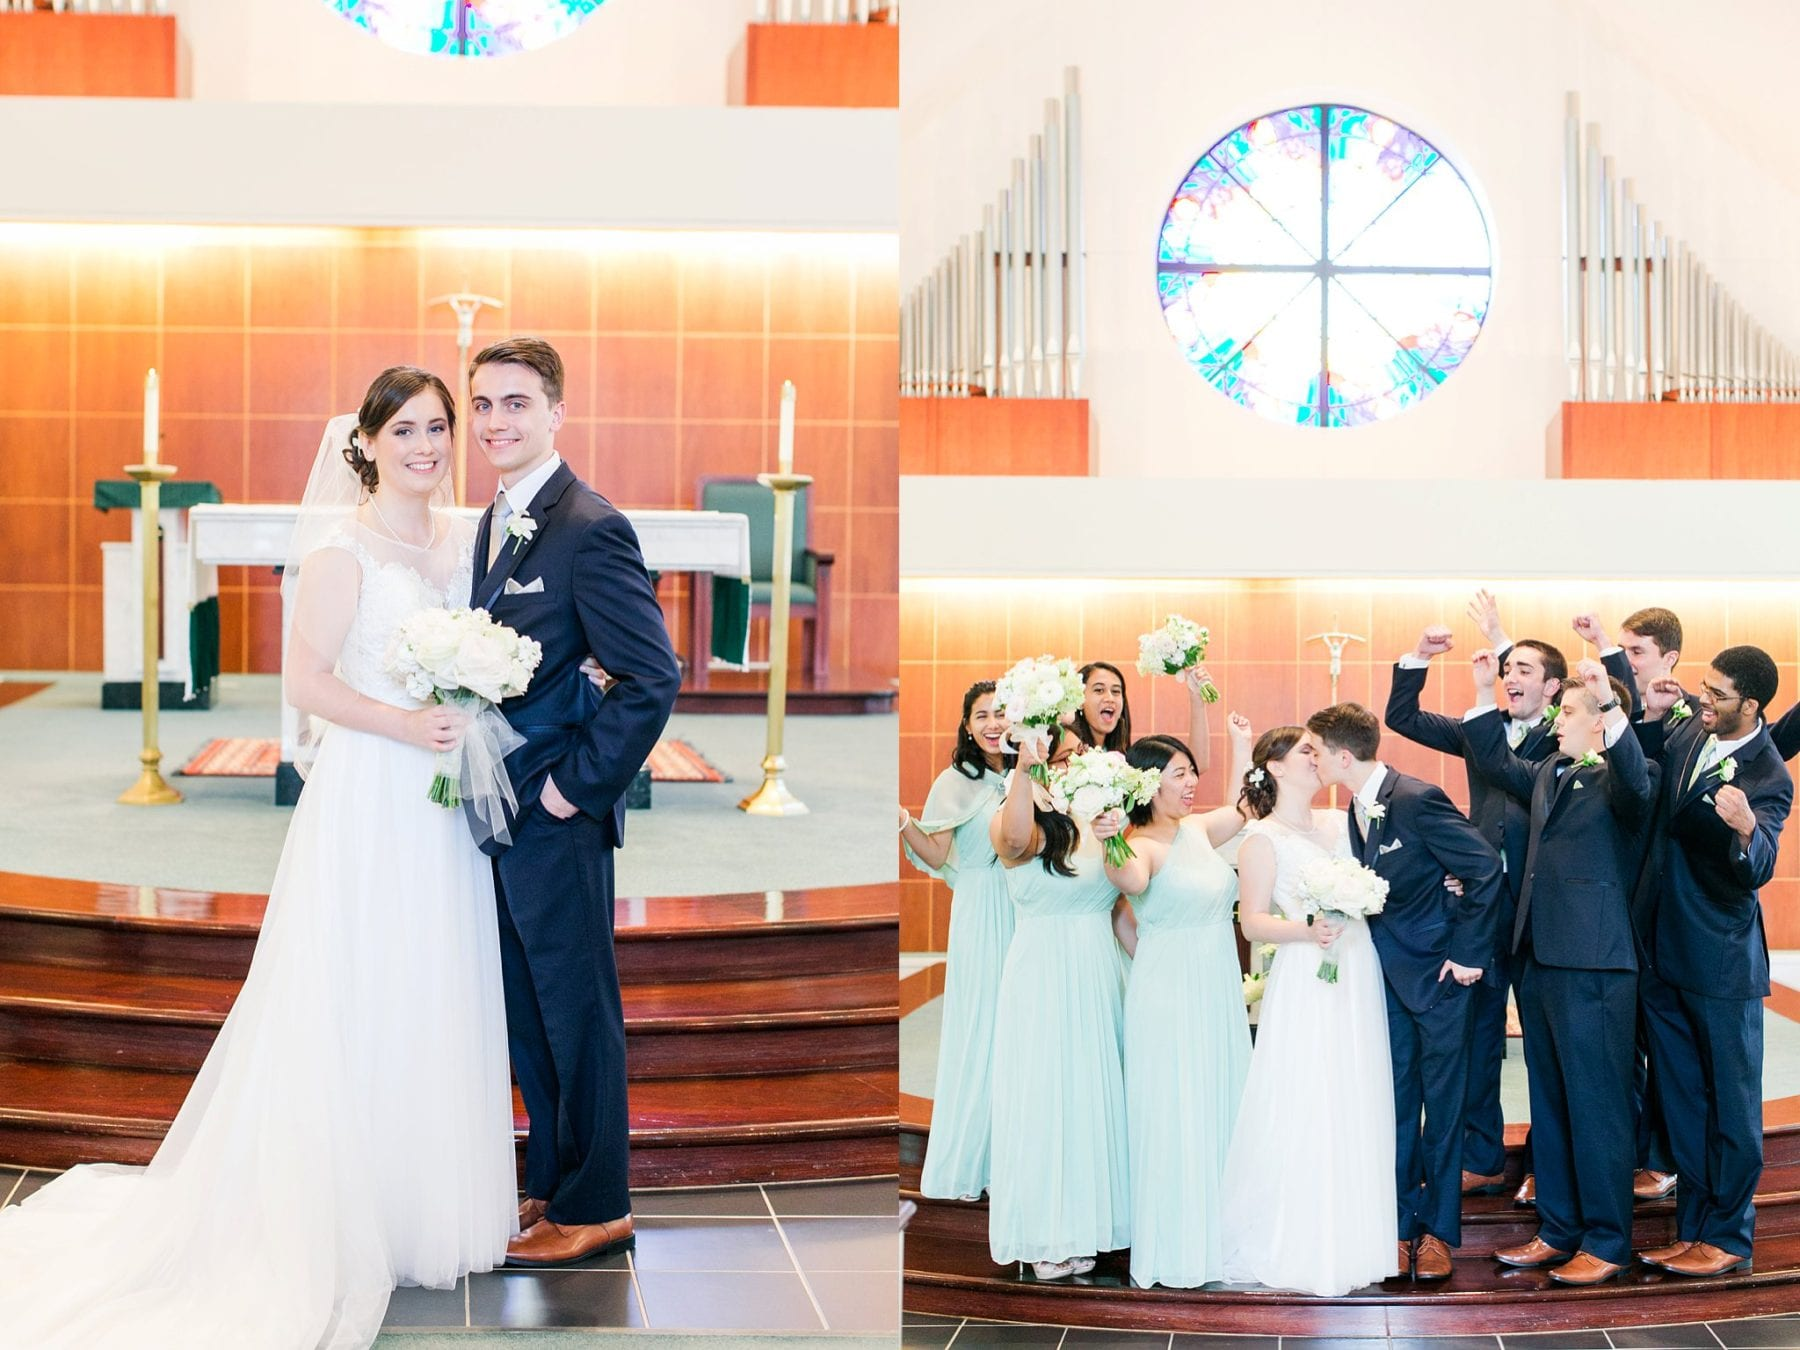 Bristow Manor Wedding Photos Virginia Wedding Photographer Lauren & Andrew Megan Kelsey Photography-331.jpg